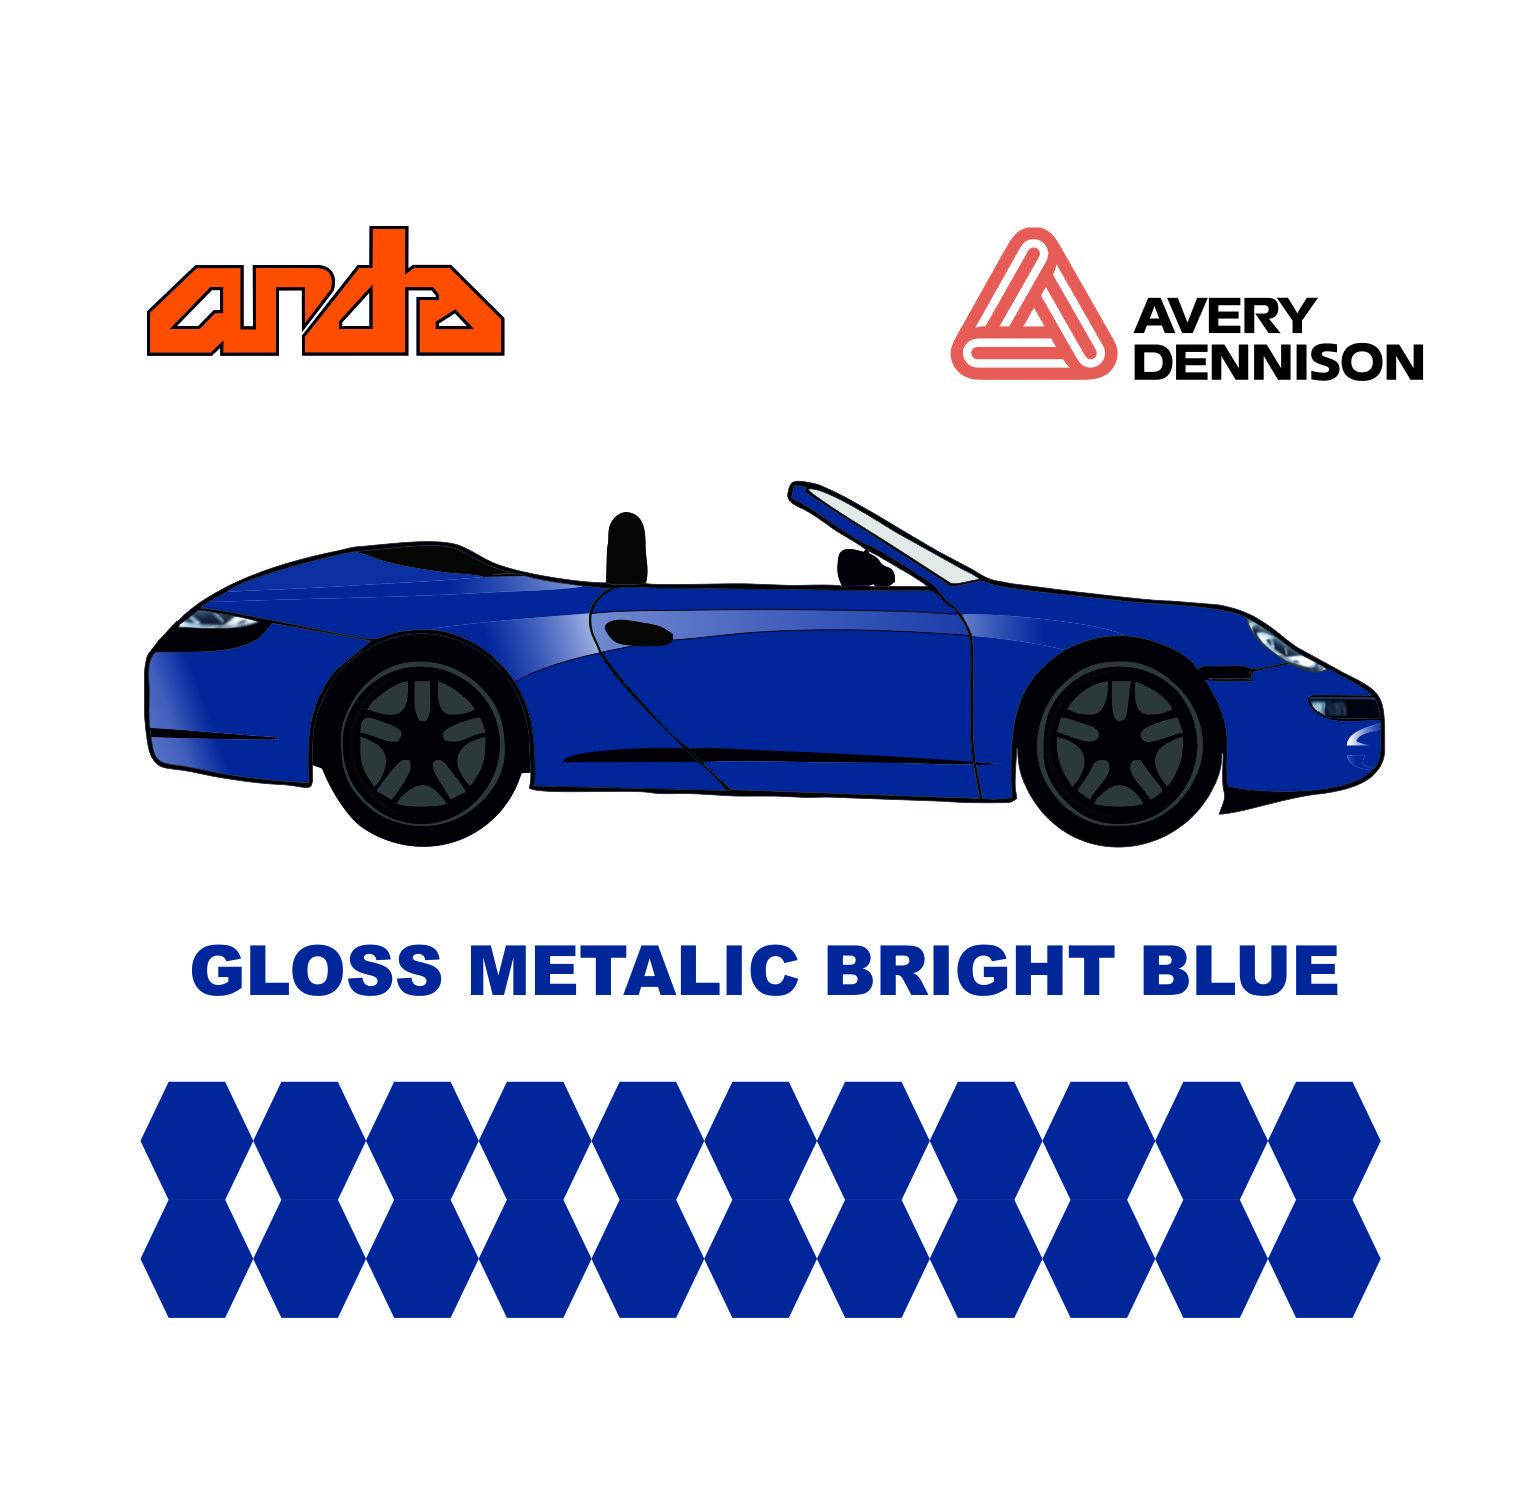 Avery Dennison-SWF Gloss Metallic Bright Blue 1